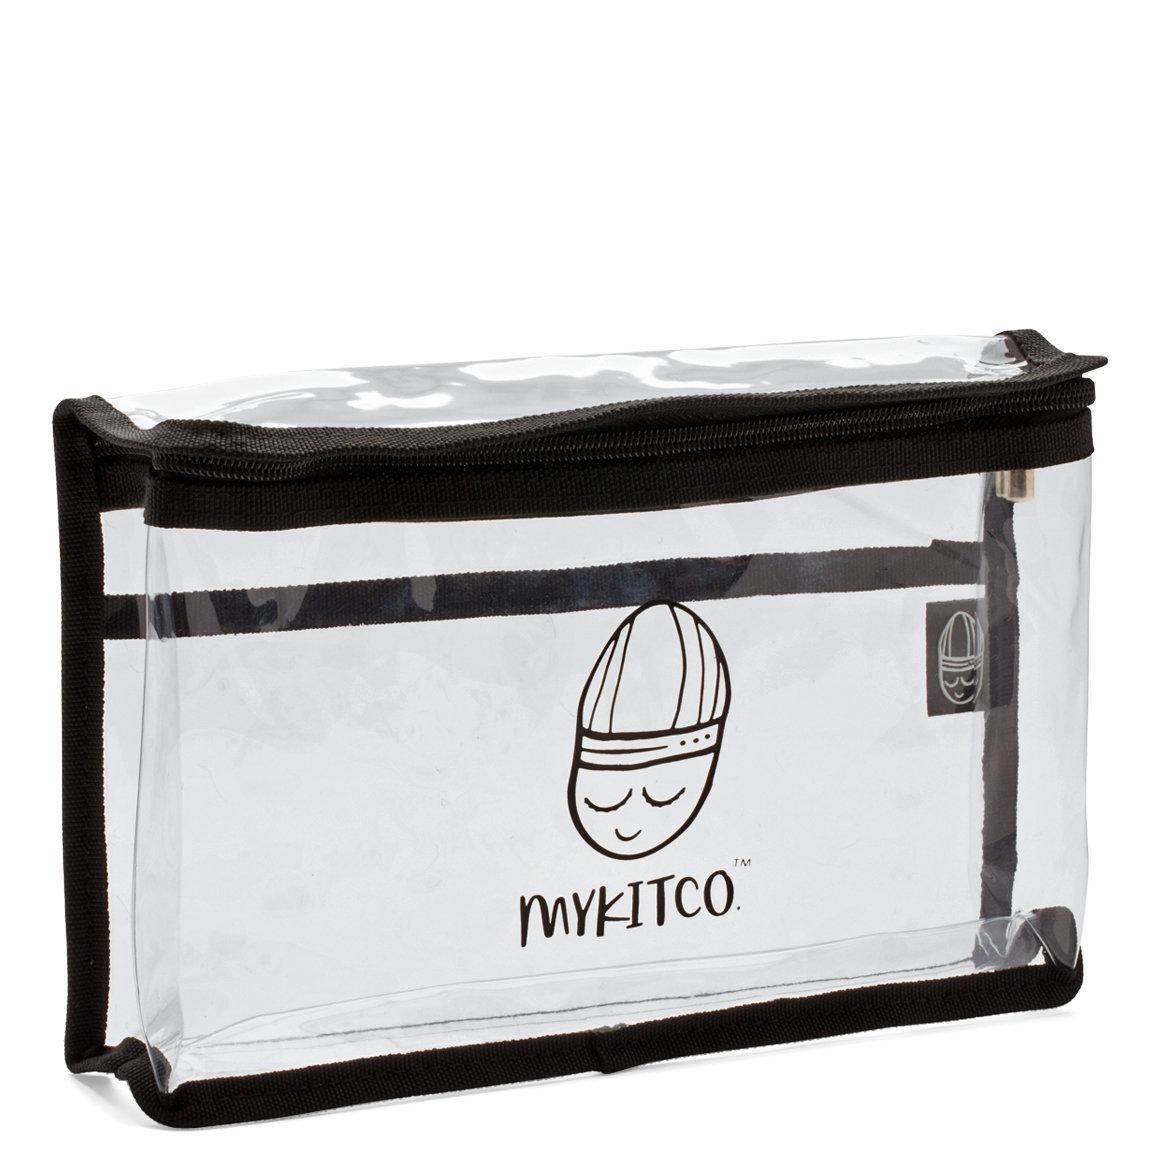 MYKITCO. My PVC Bag product swatch.